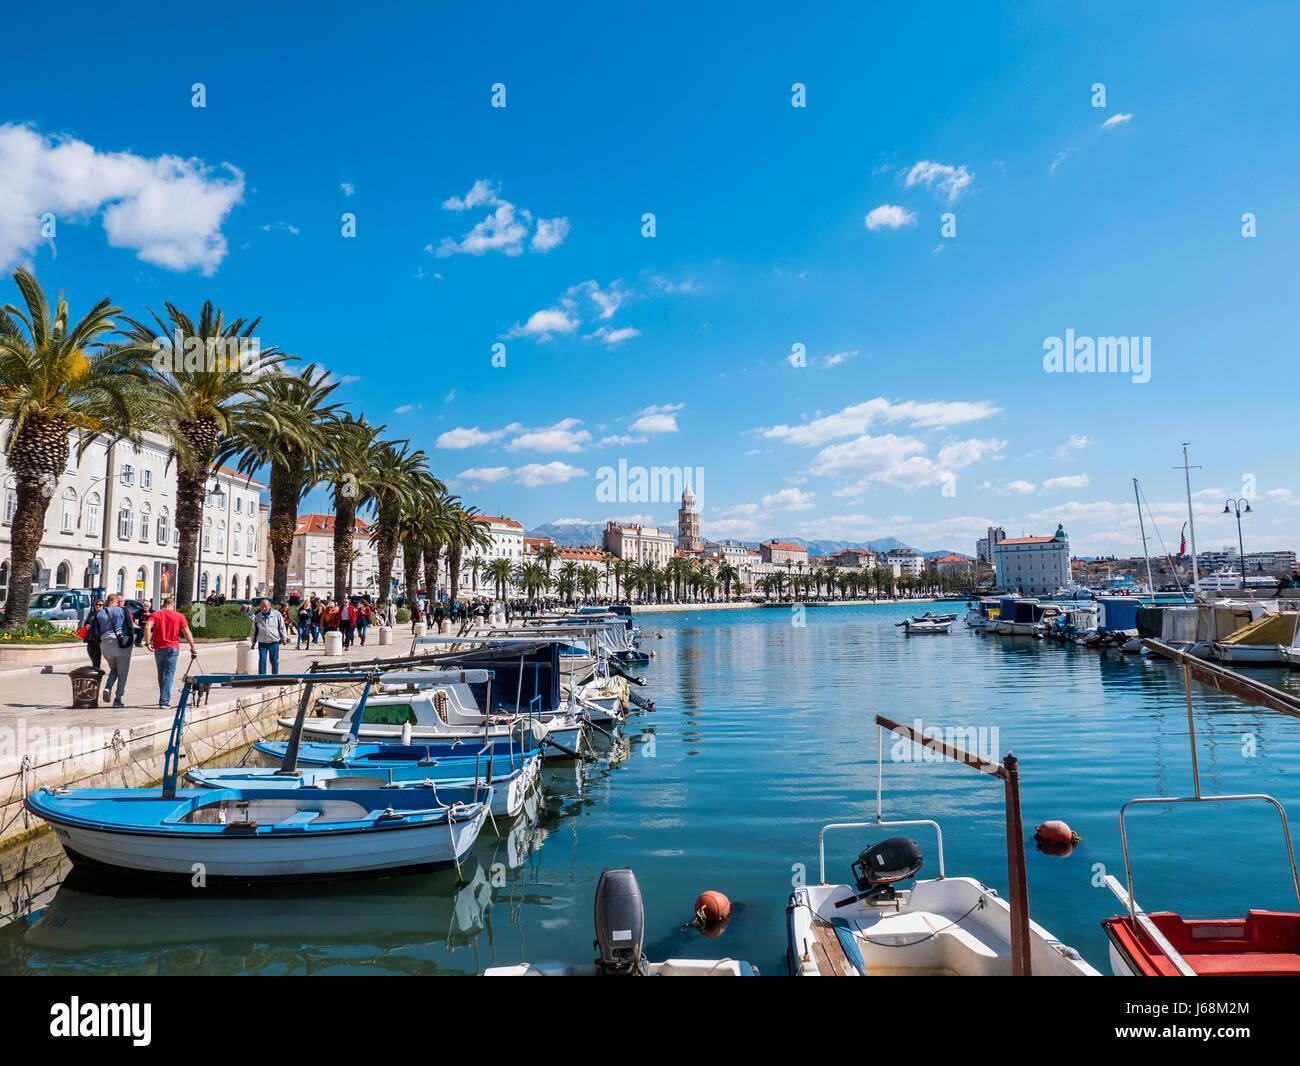 Split, Kroatien - 27. März 2016 - Split, Kroatien, an einem sonnigen Tag mit blauem Himmel. Stockbild